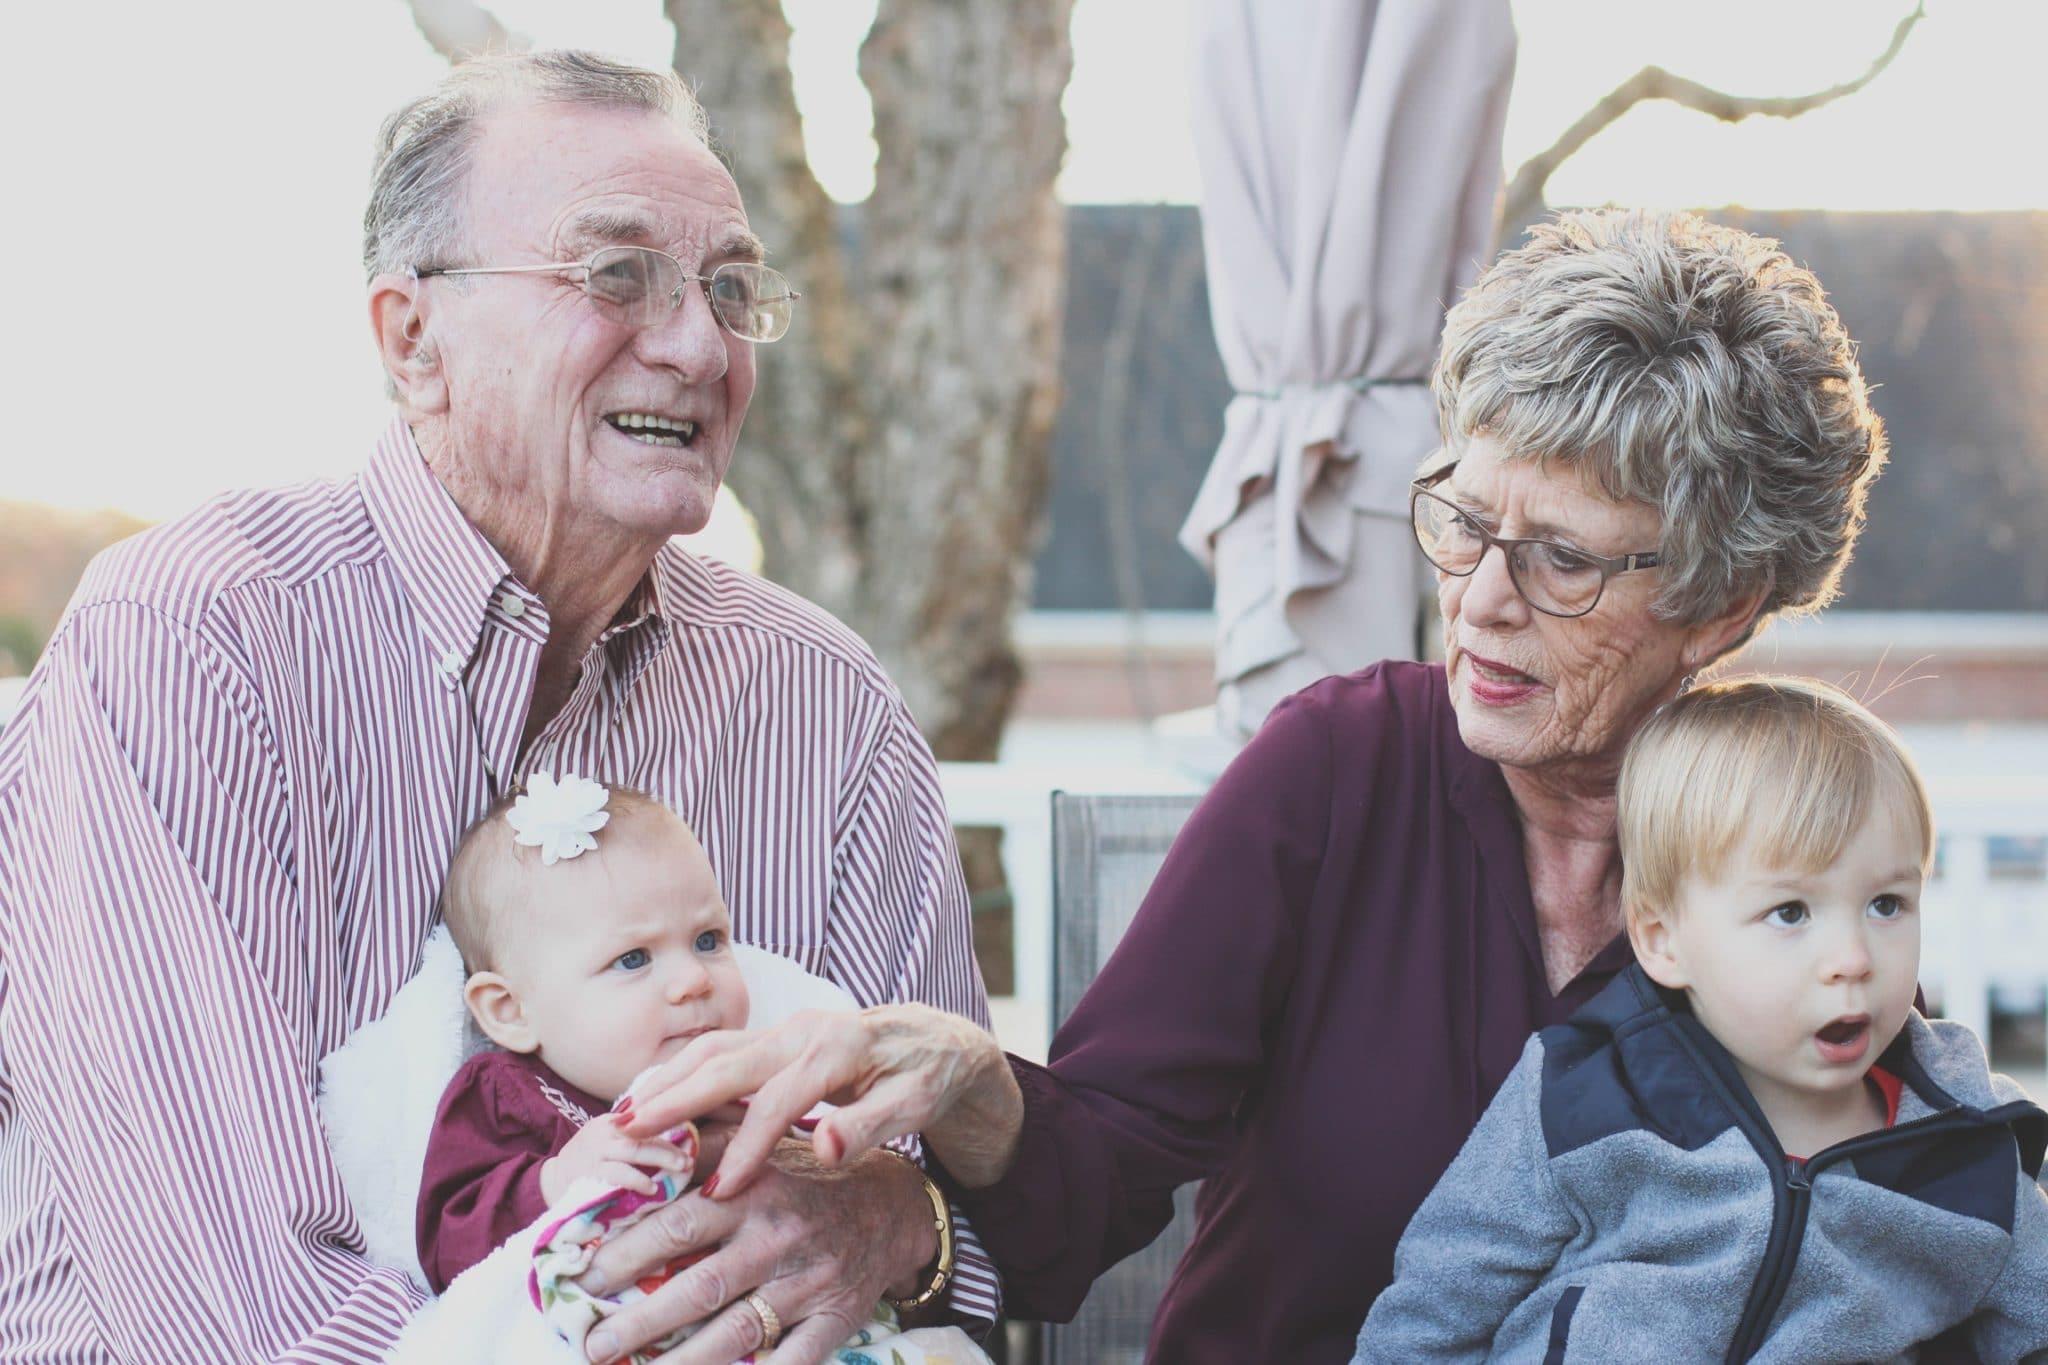 Grandma and Grandpa at a Healthier Home